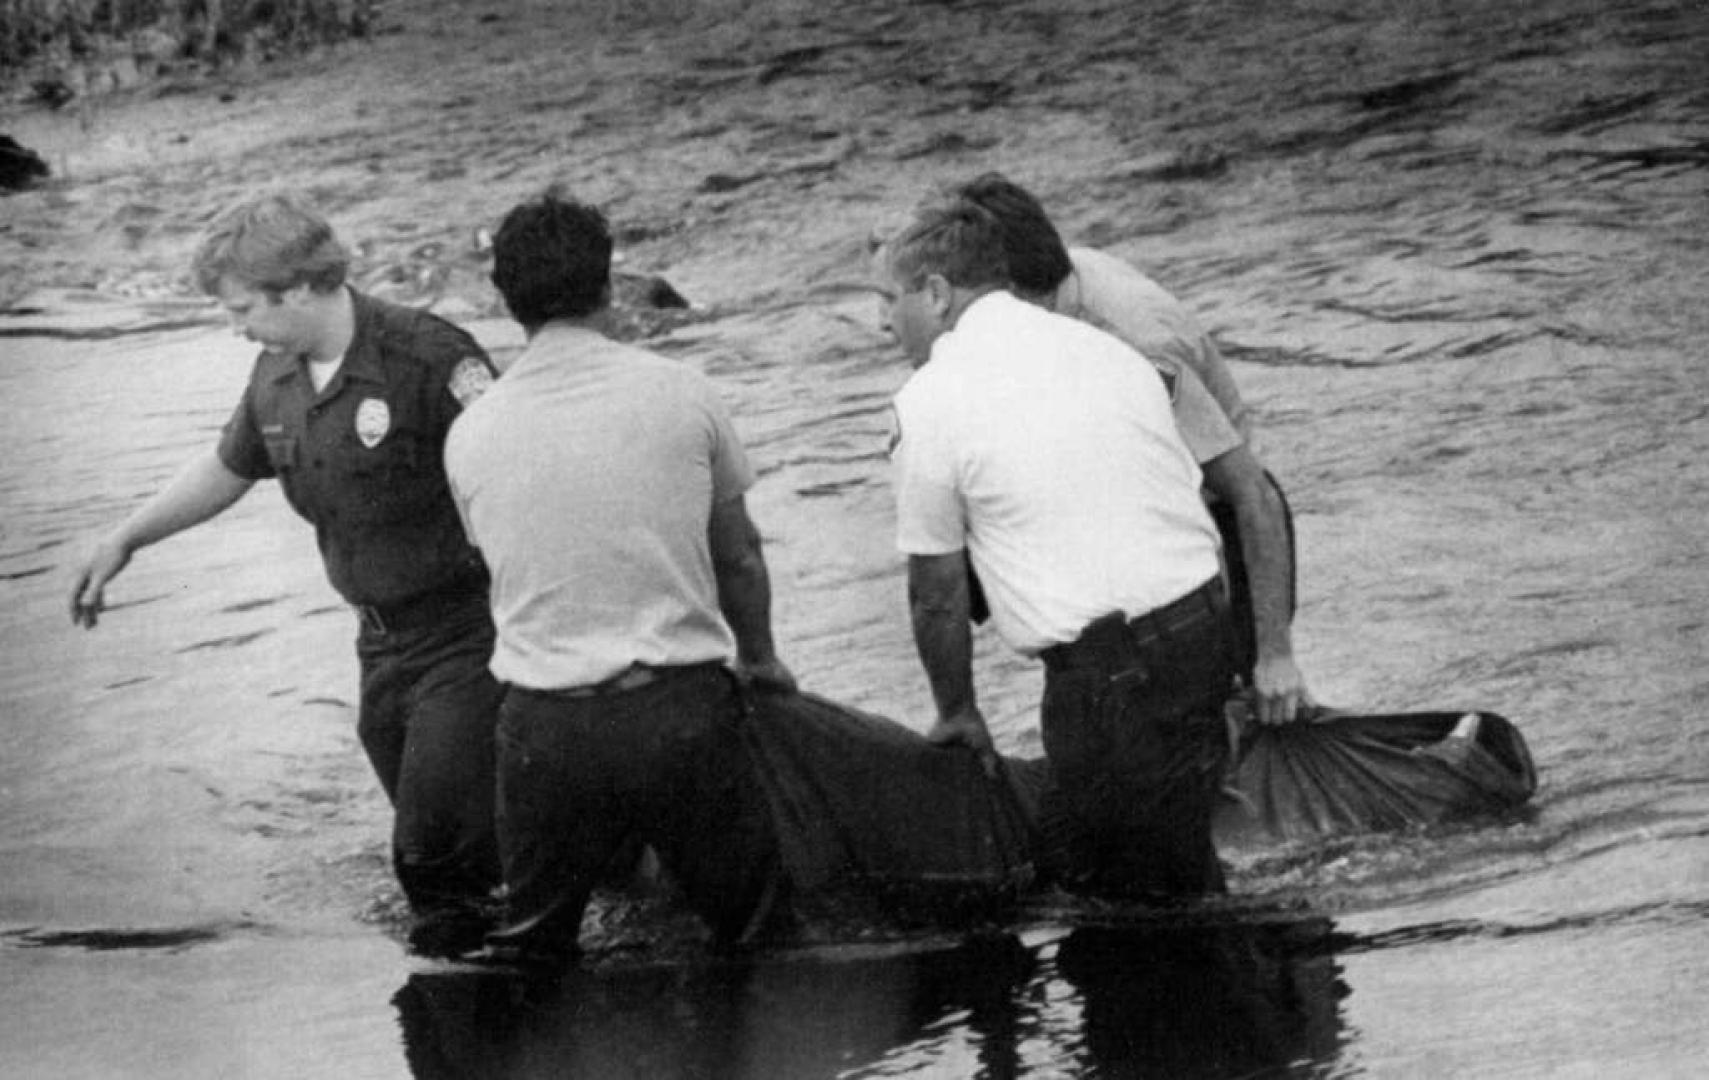 Gary Ridgway 1. kép